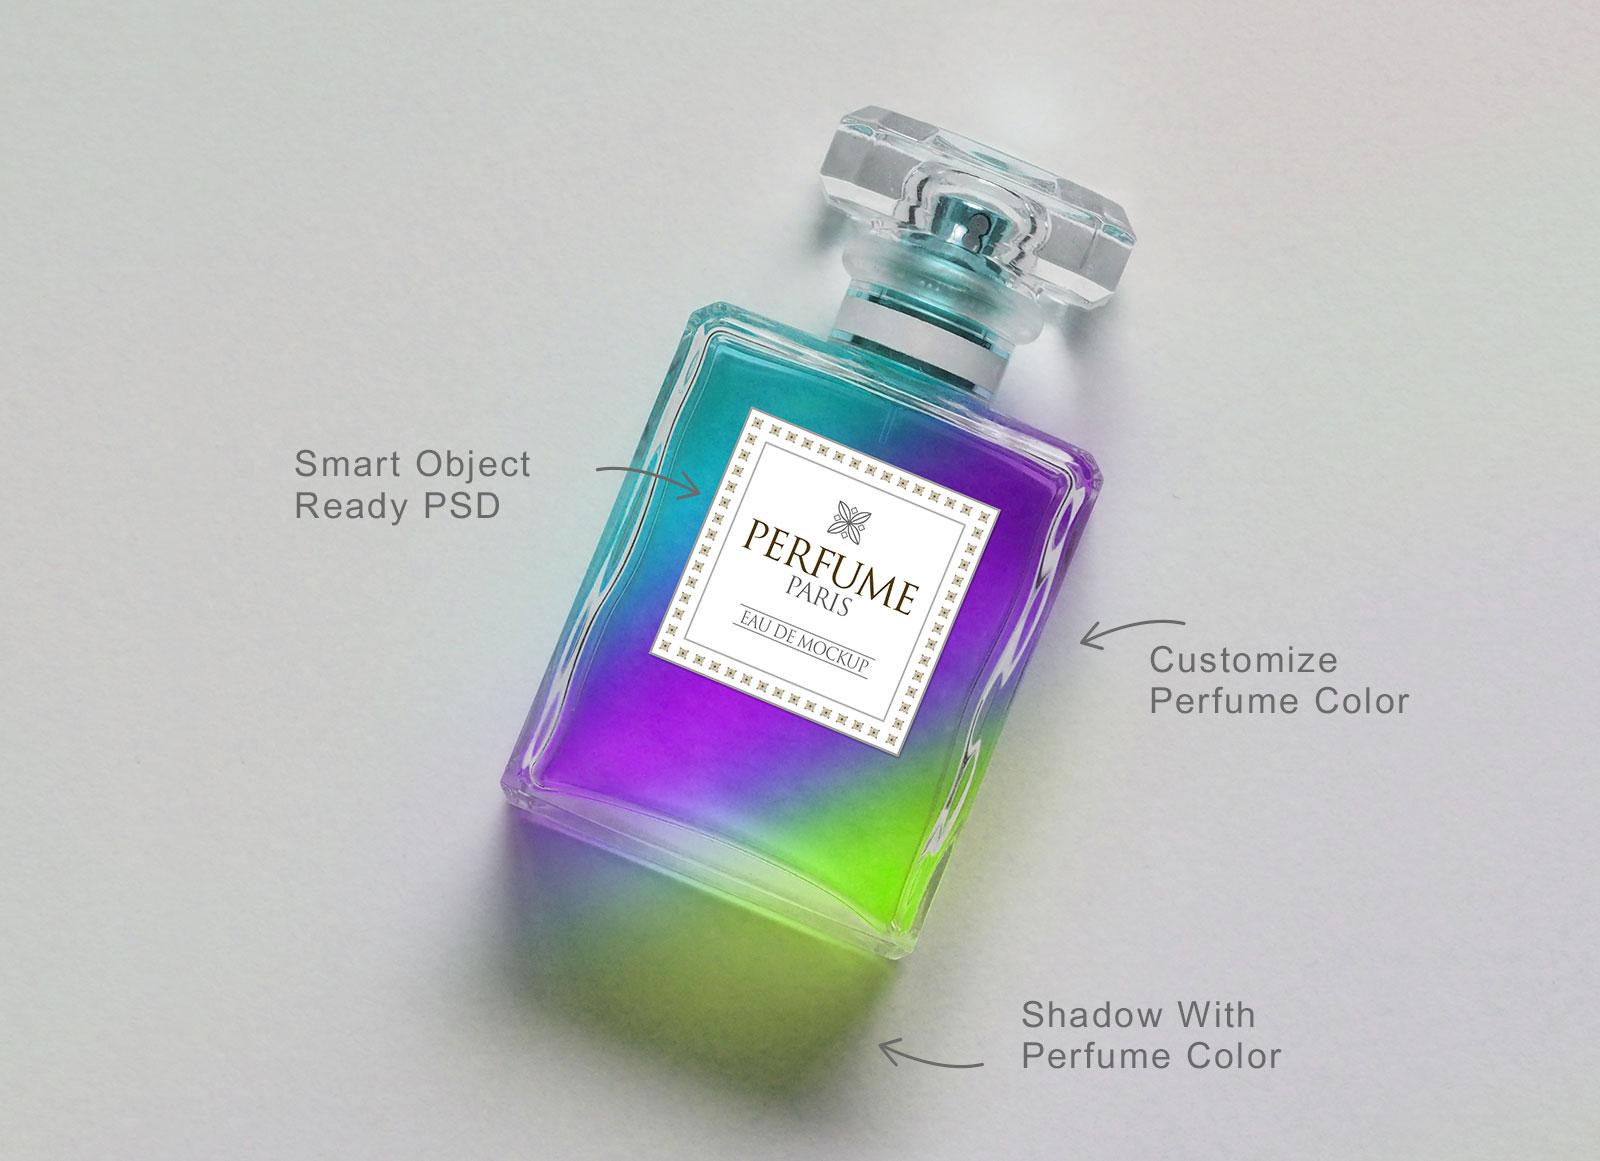 Free-Scent-Perfume-Body-Spray-Bottle-Mockup-PSD-File